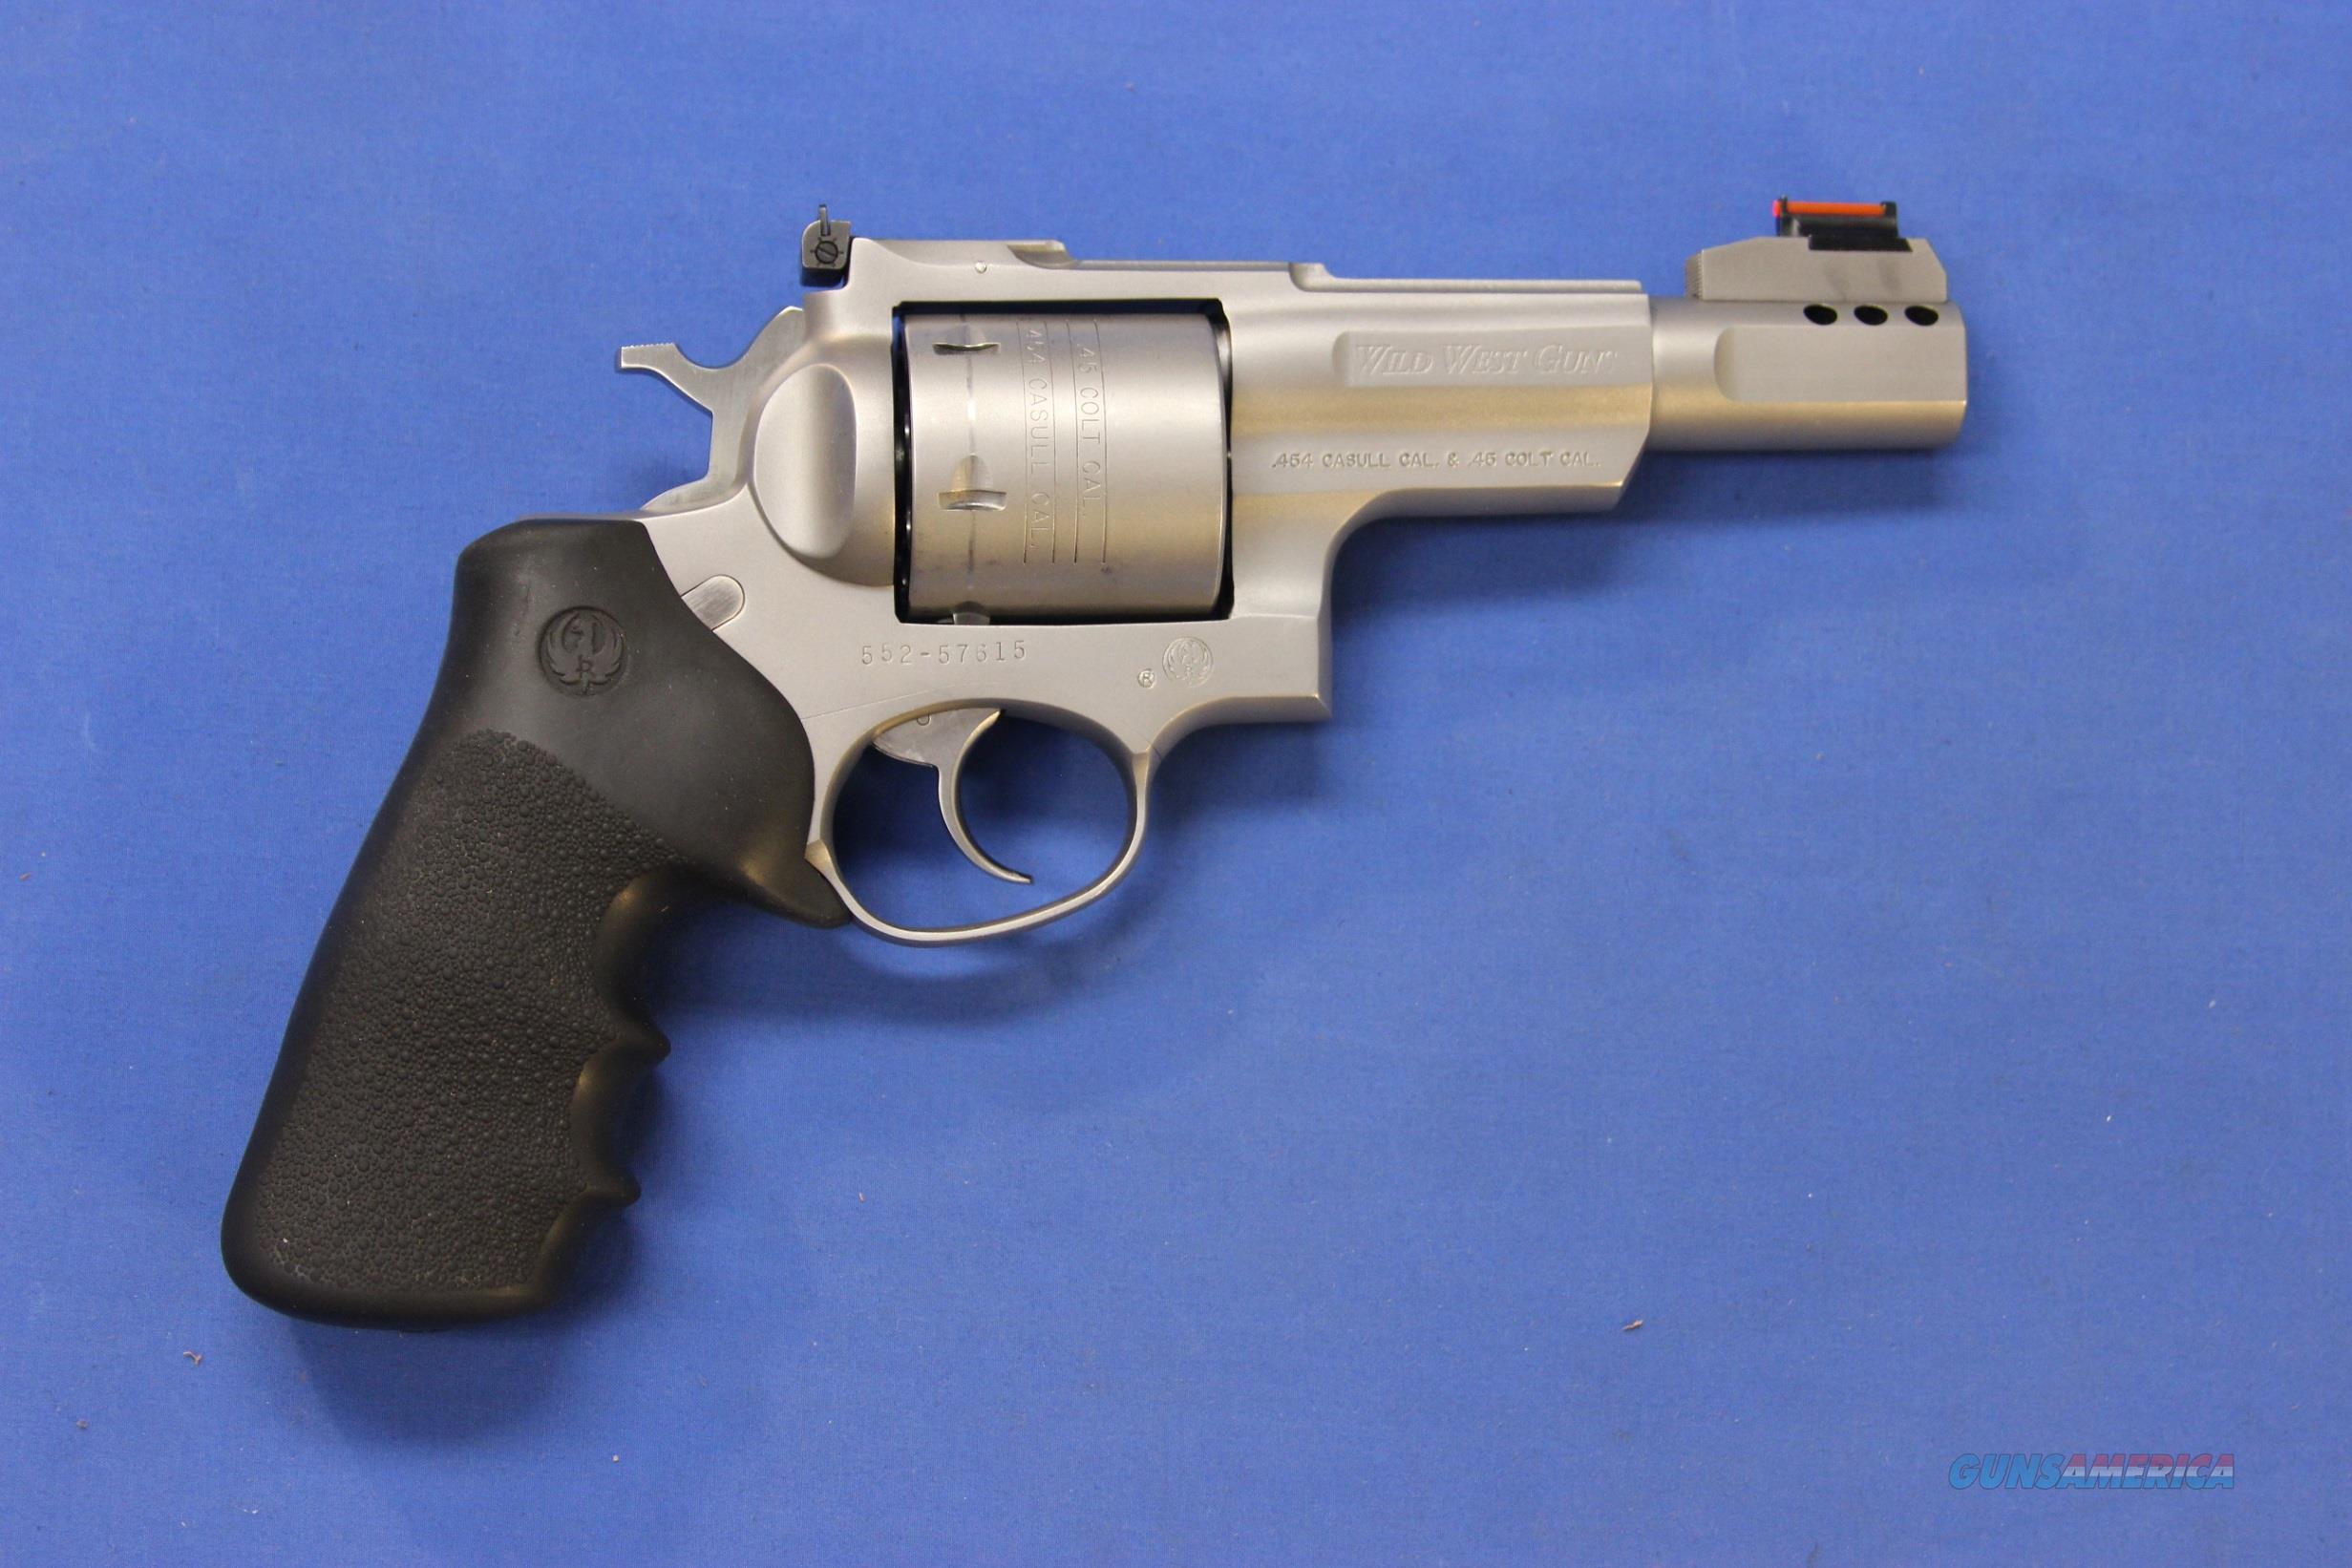 WILD WEST GUNS WOLVERINE (SUPER REDHAWK) .454 CASULL .45 COLT Guns 43a501d31fcb